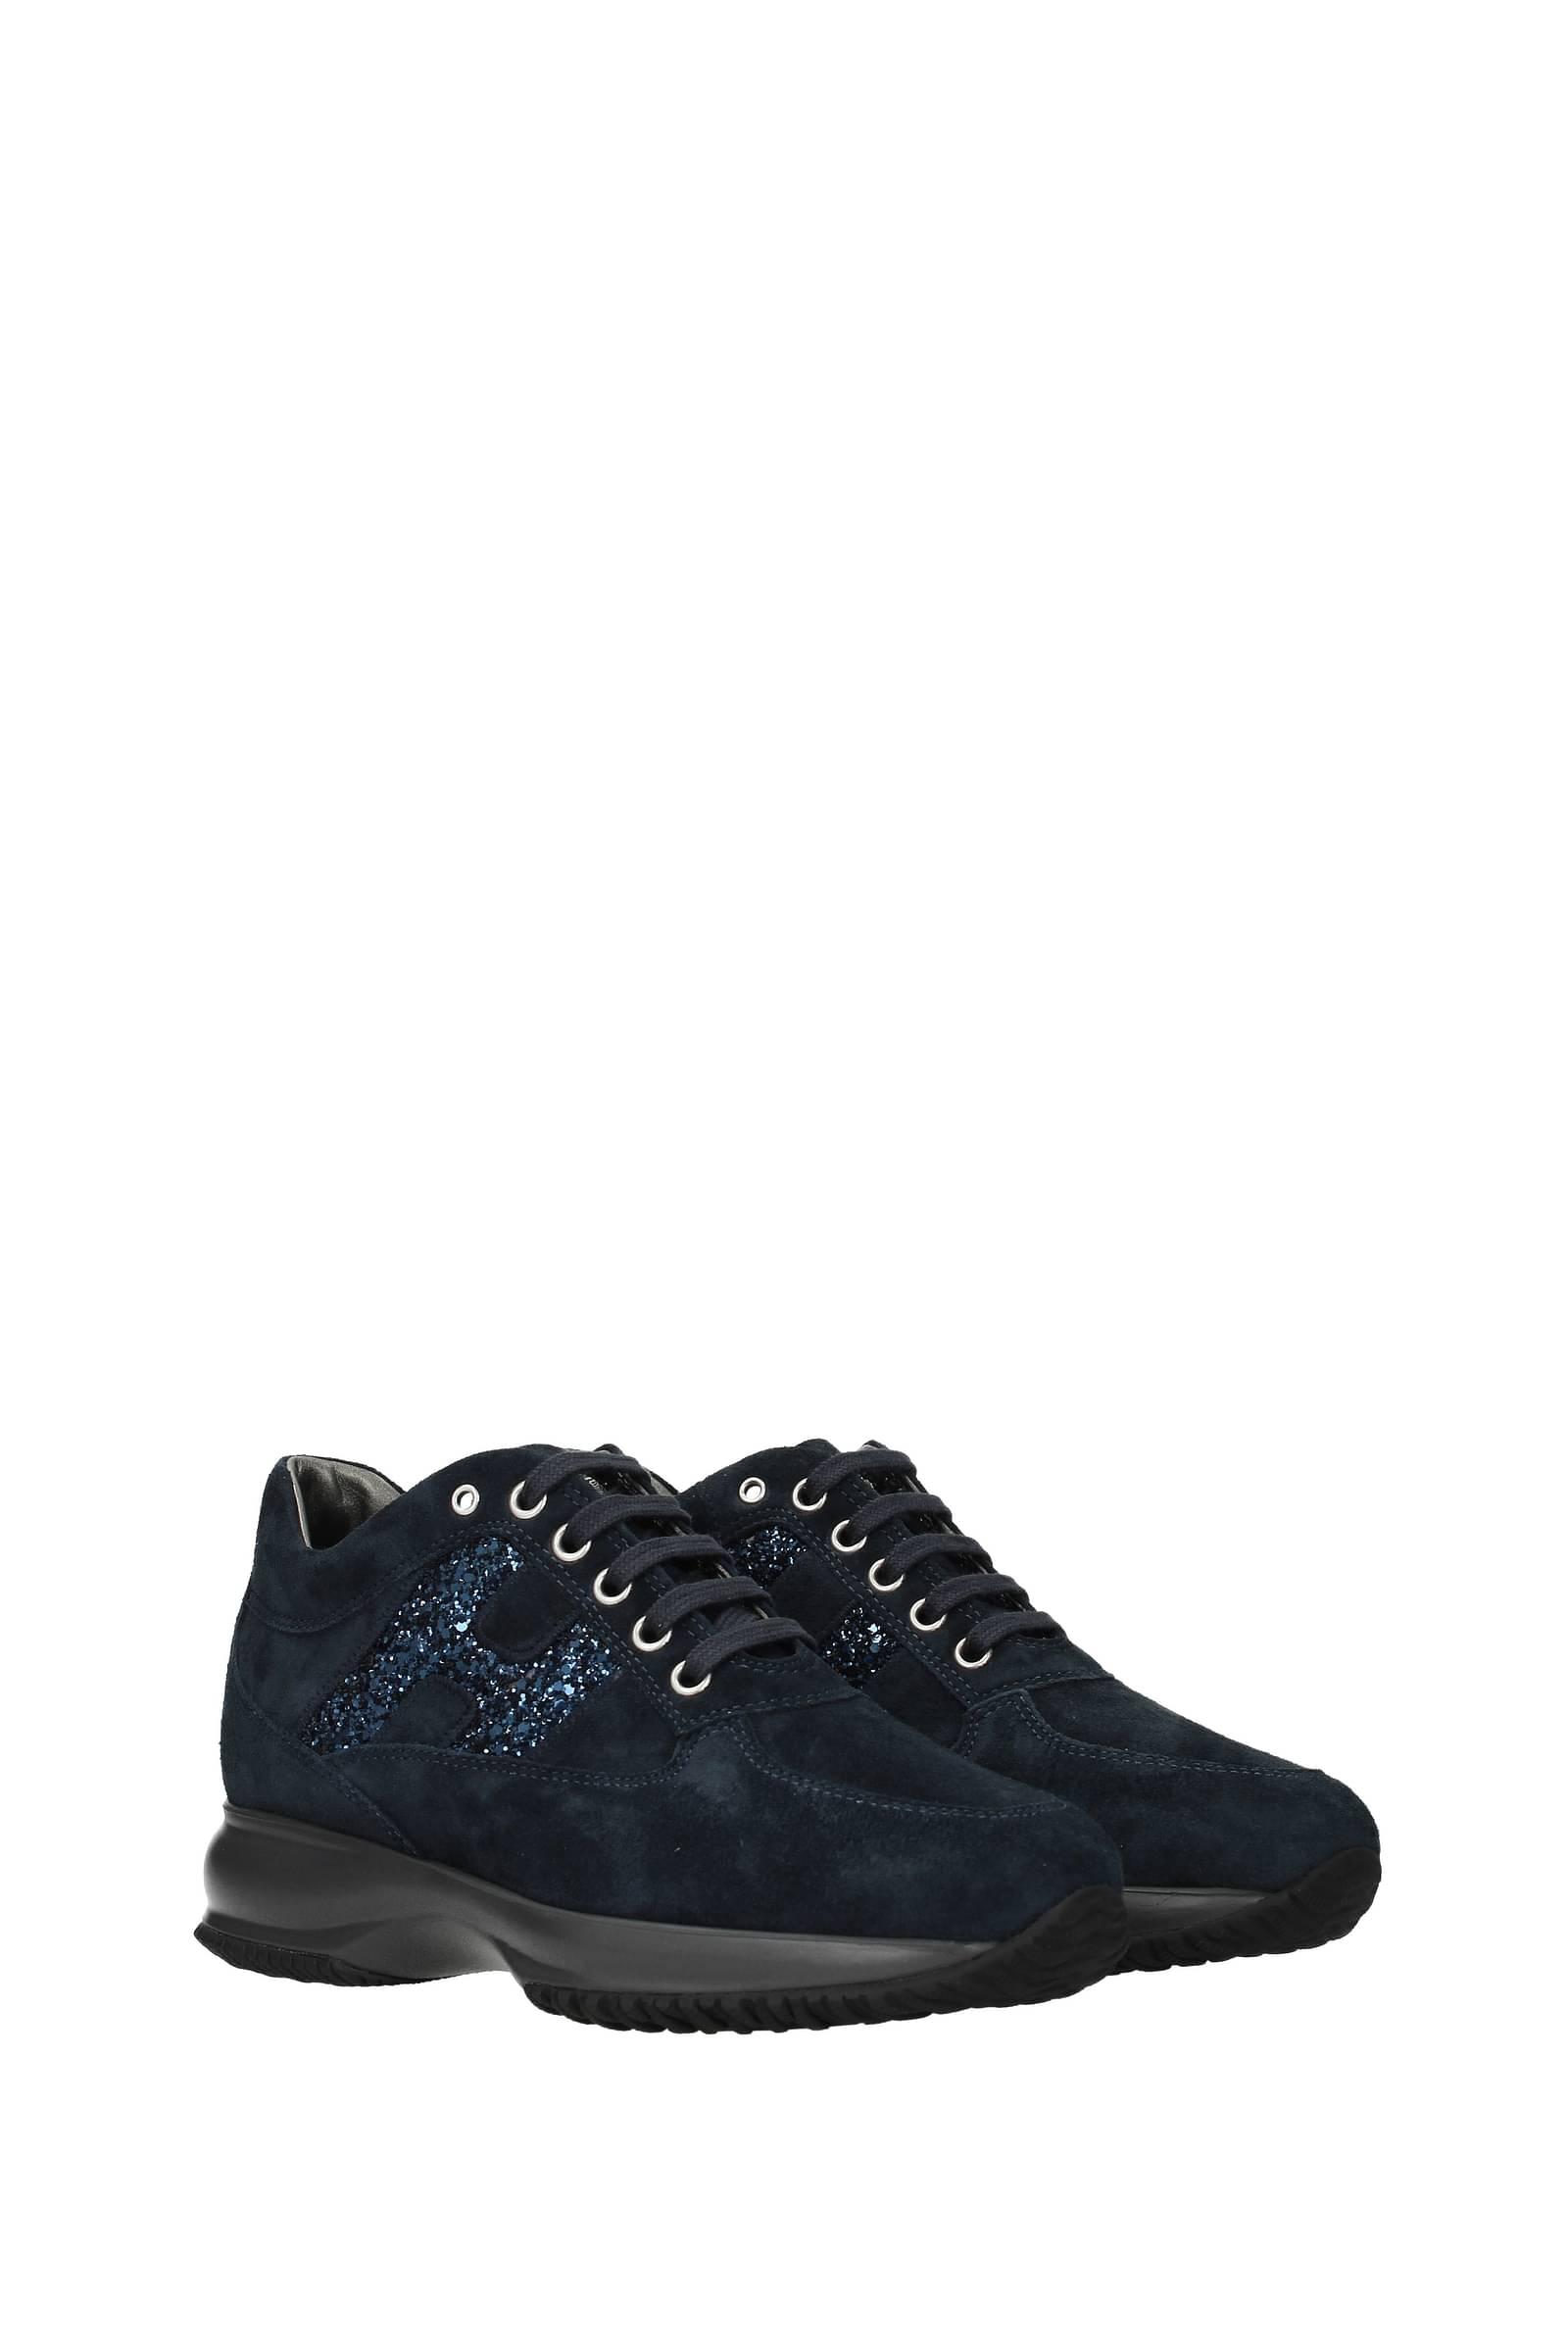 Hogan Sneakers interactive Donna HXW00N0S3609KE1001 Camoscio 147€